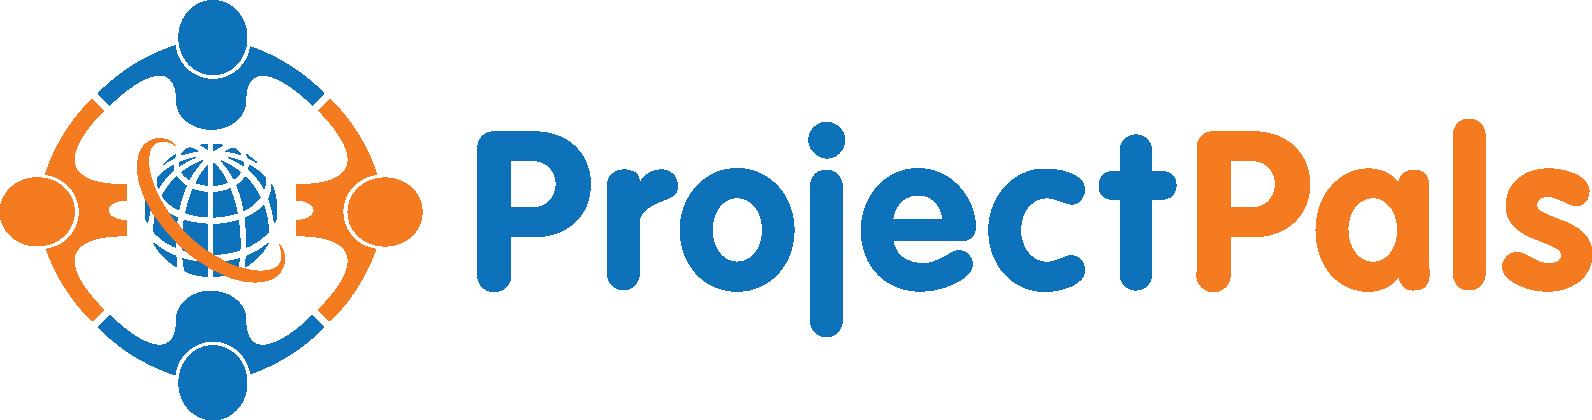 Project Pals